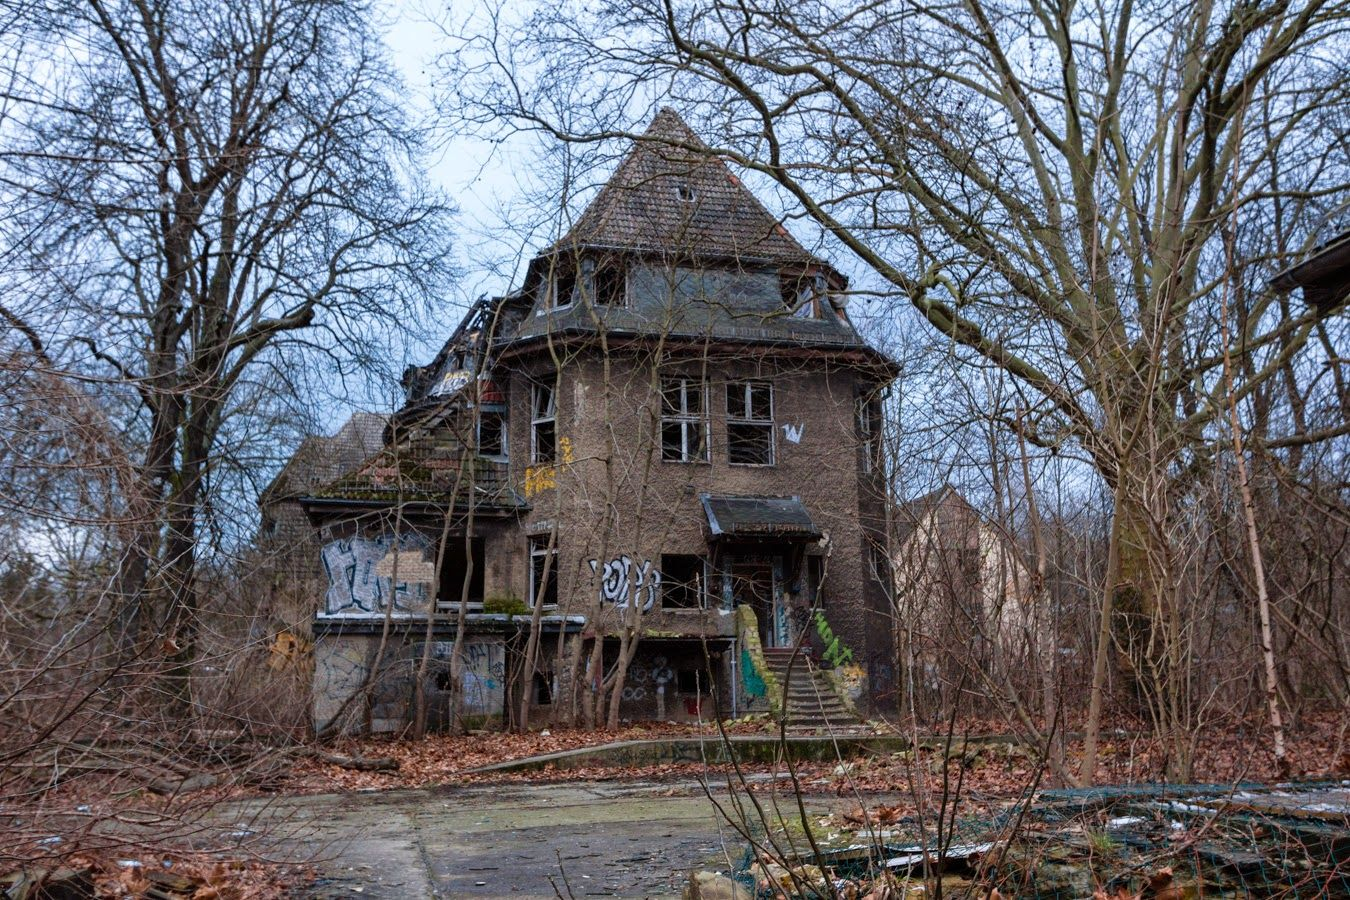 Kinderkrankenhaus Weißensee, an abandoned children's